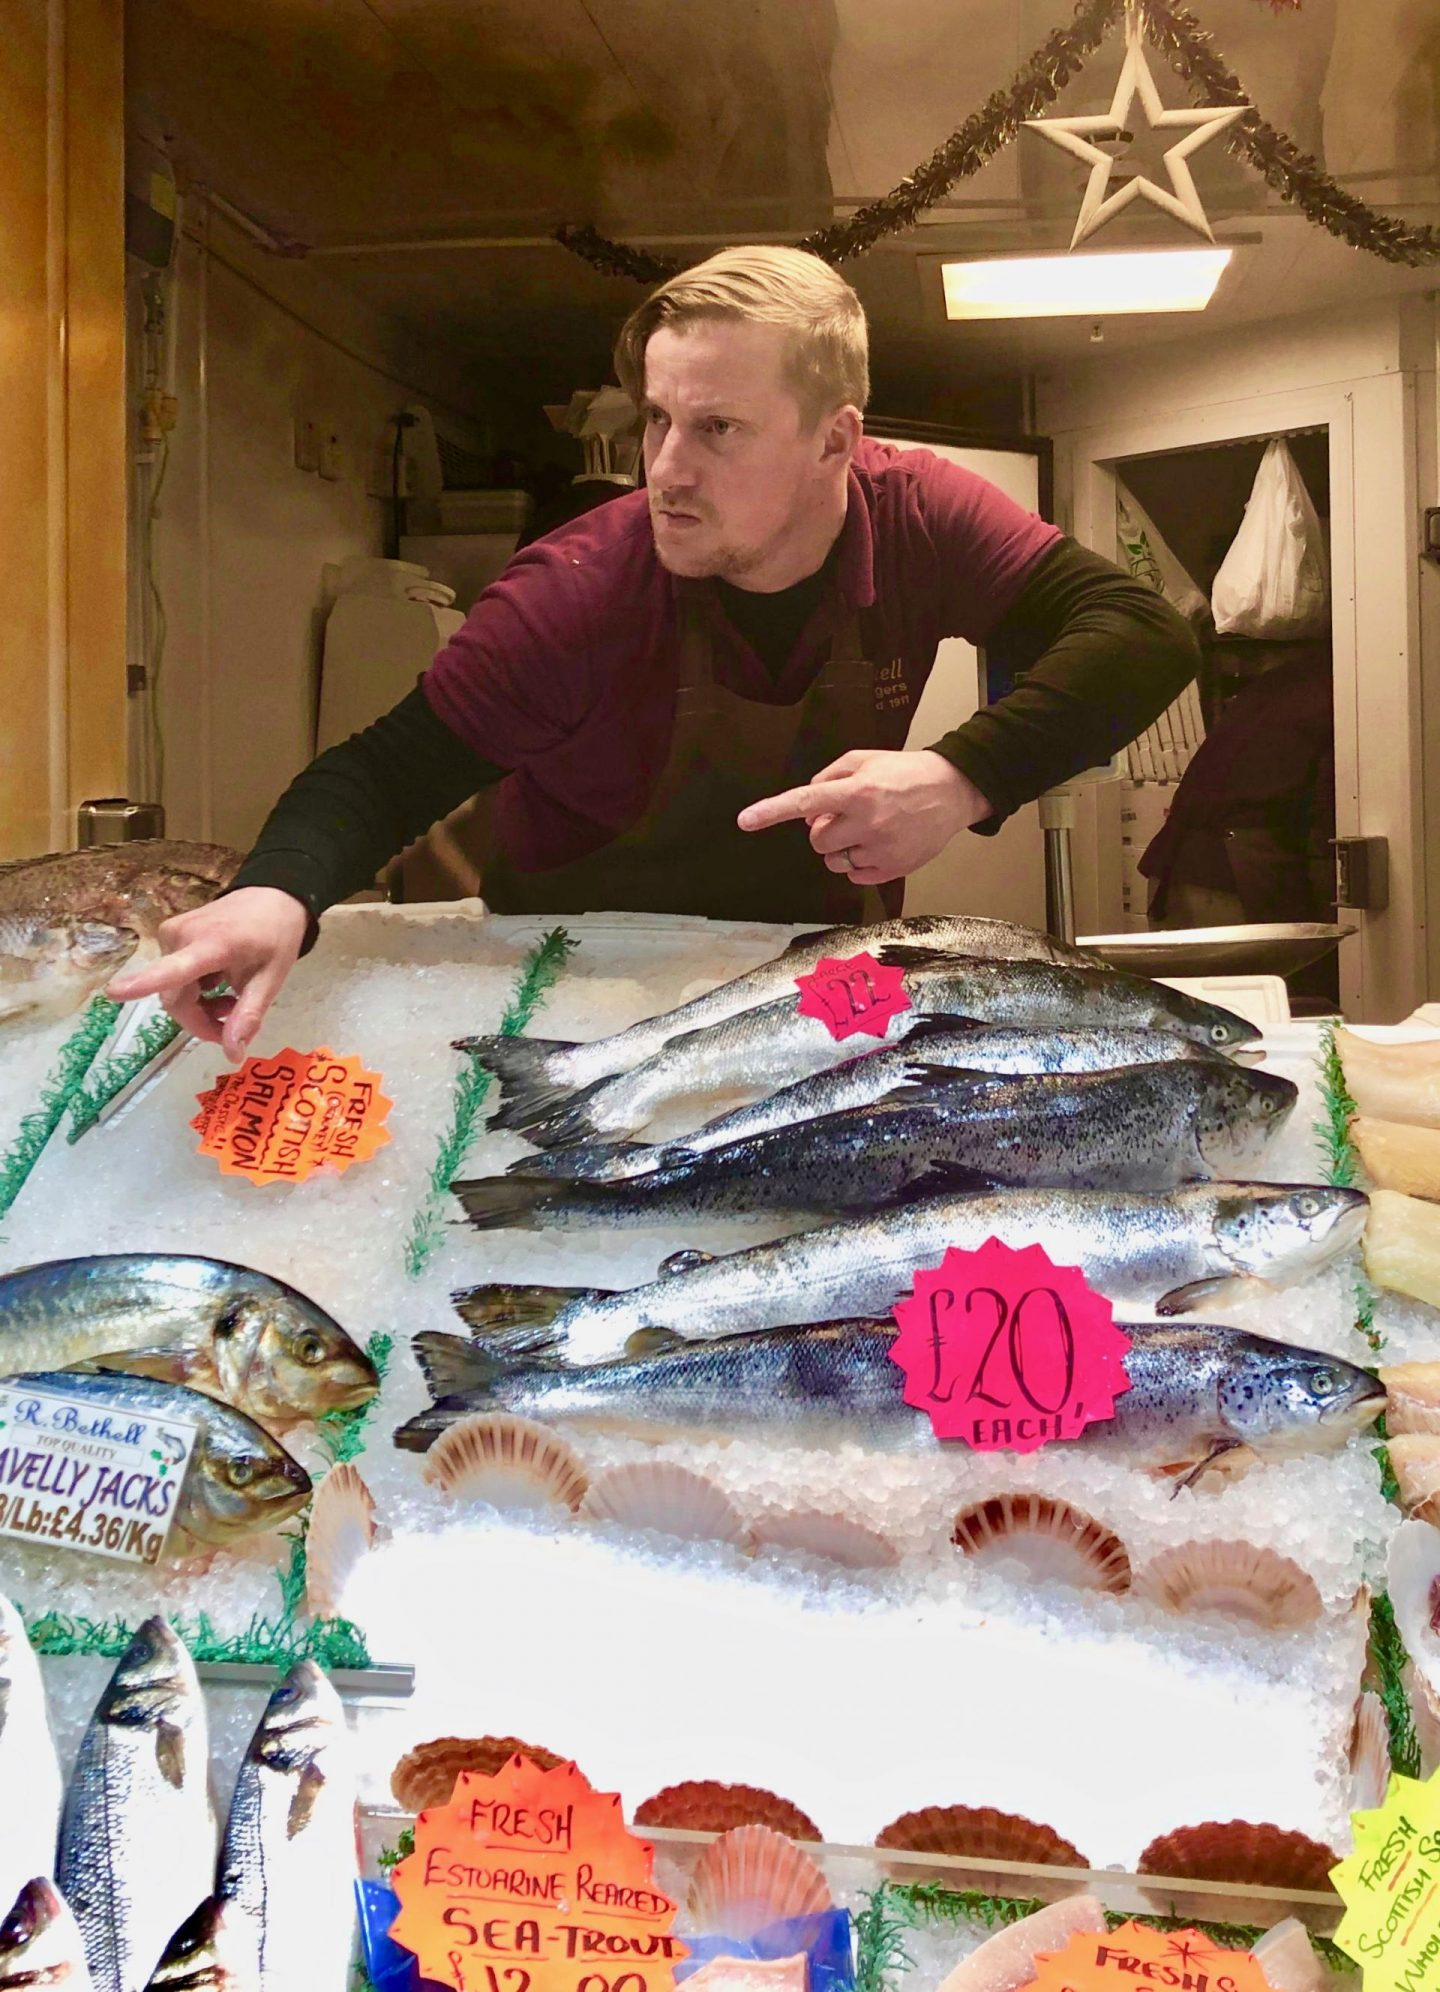 Fishmonger posing at Leeds Kirkgate Market